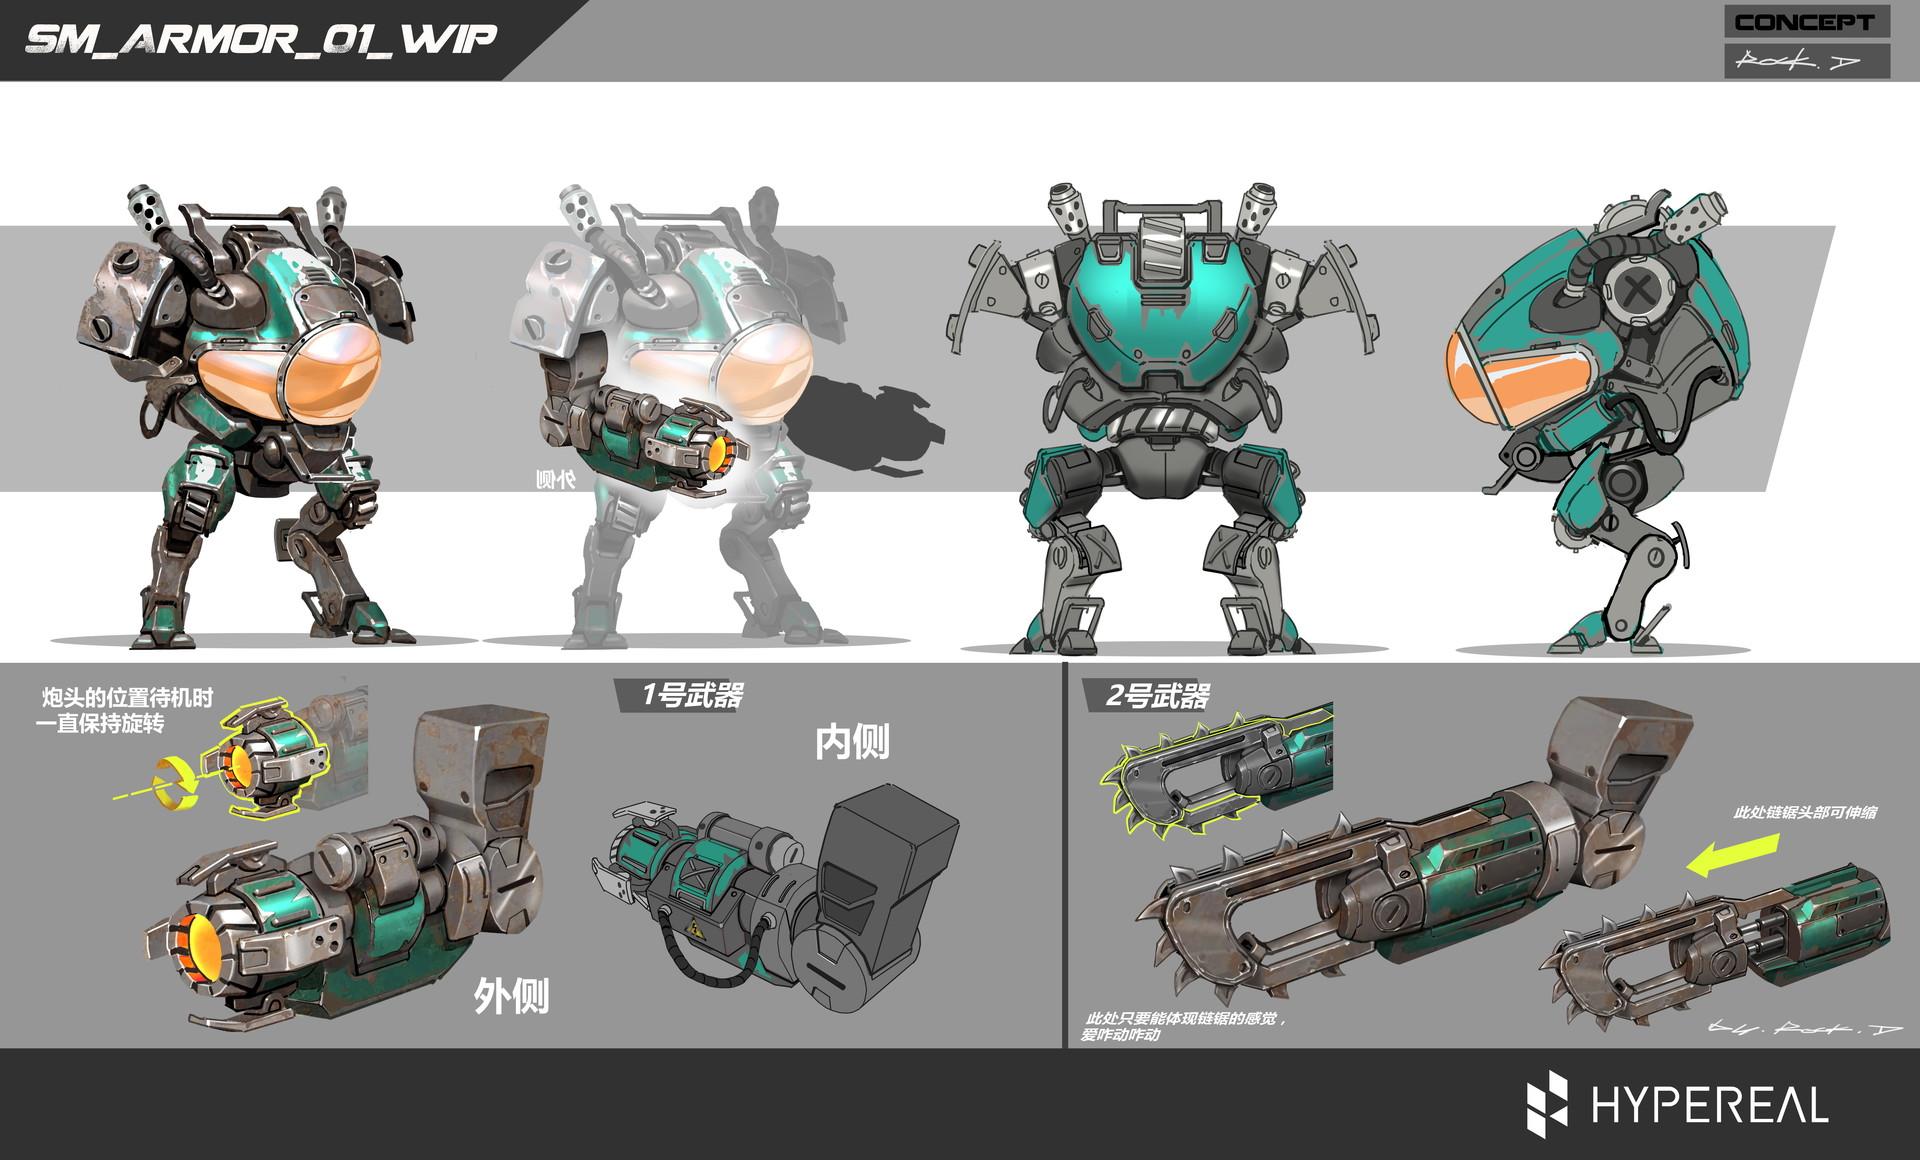 Rock d sm armor 01 wip